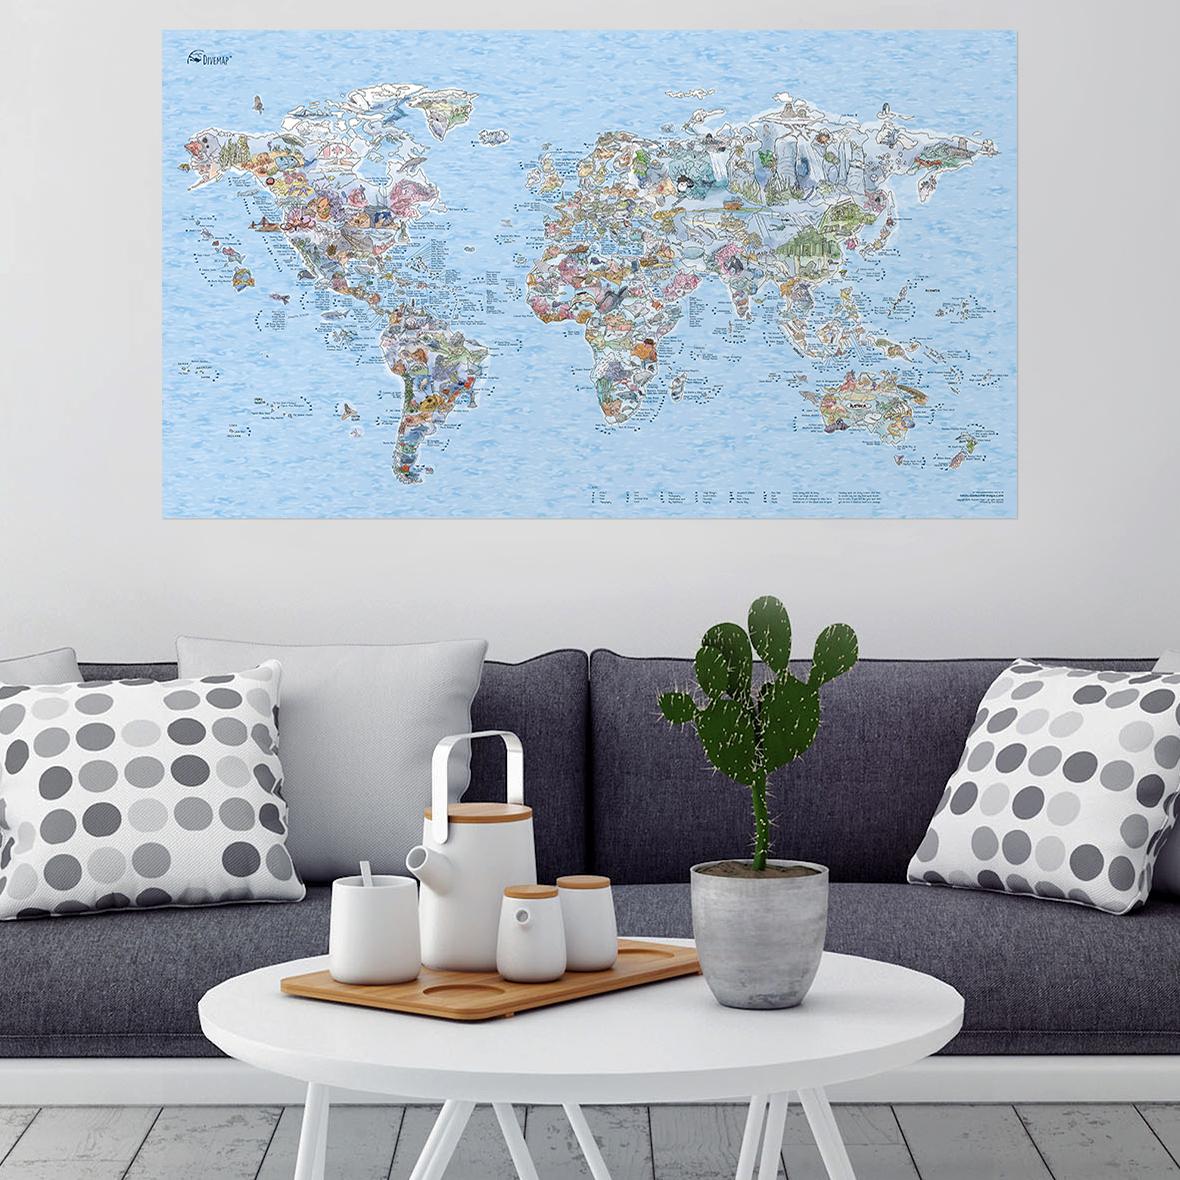 Duikspots wereldkaart